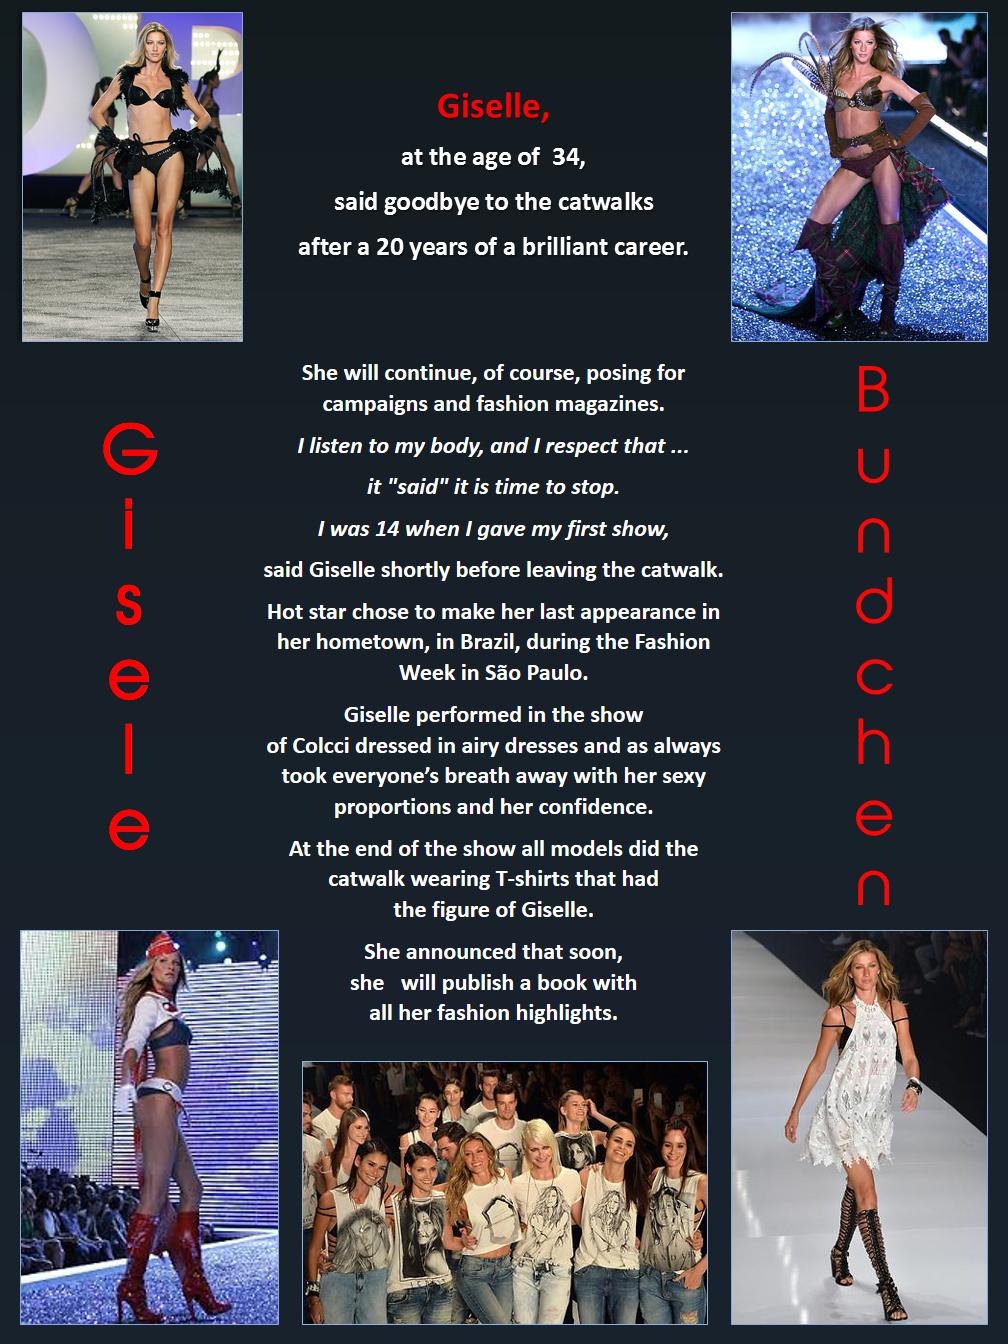 Gisele Bundchen - The last catwalk